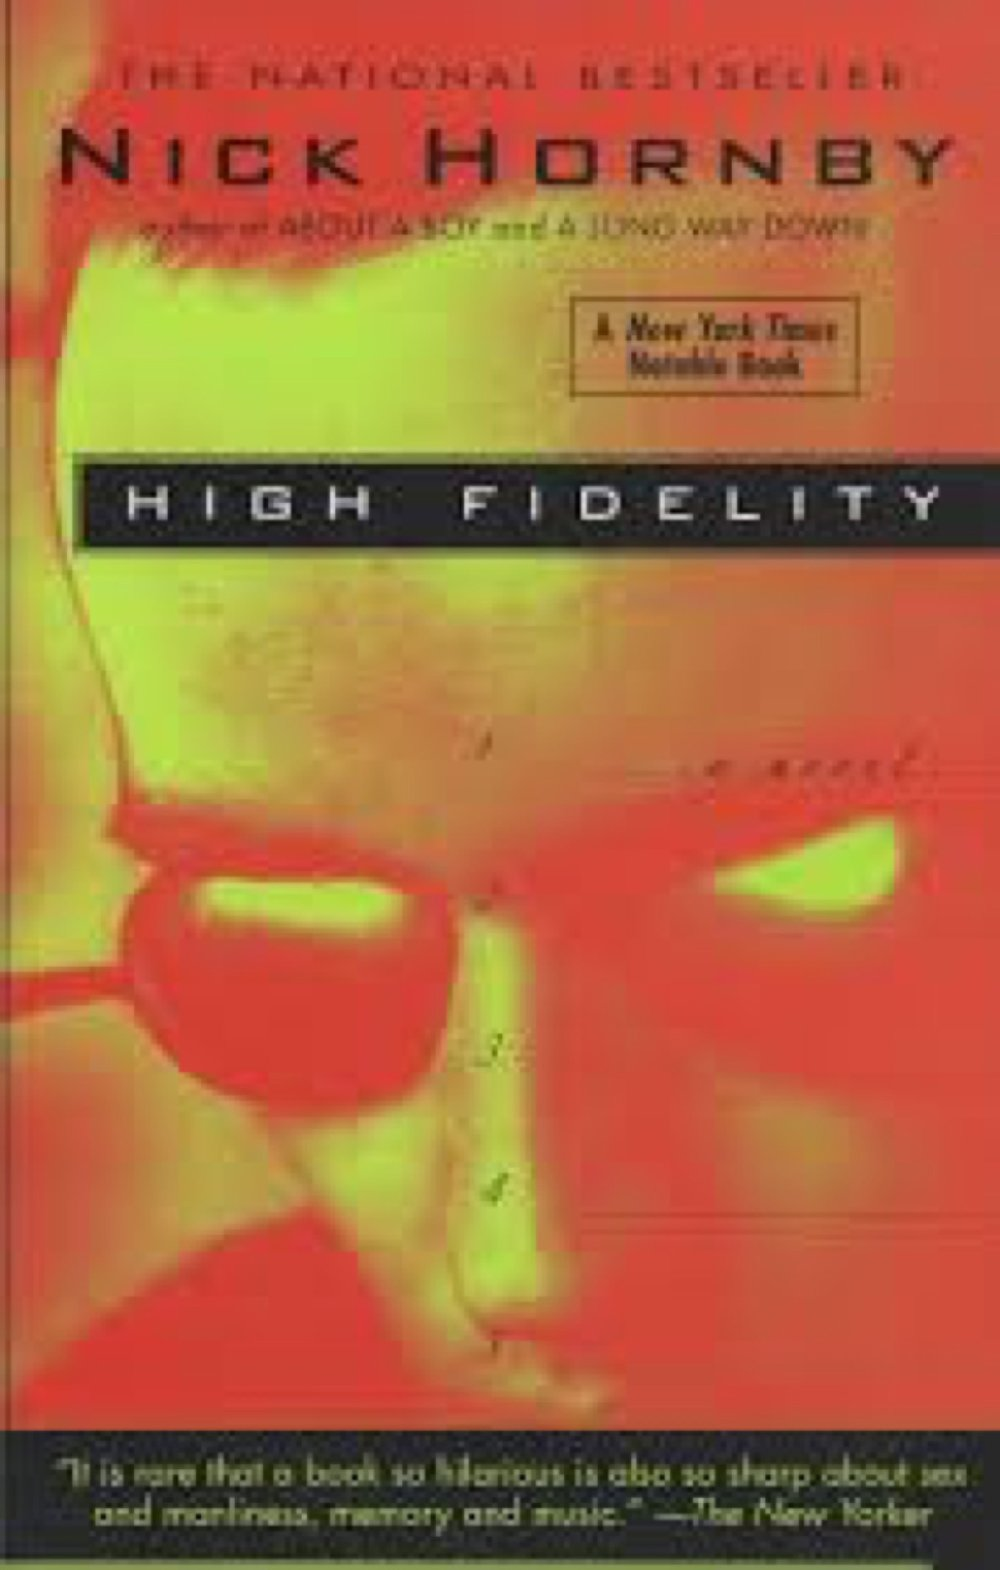 high-fidelity (1920).jpeg